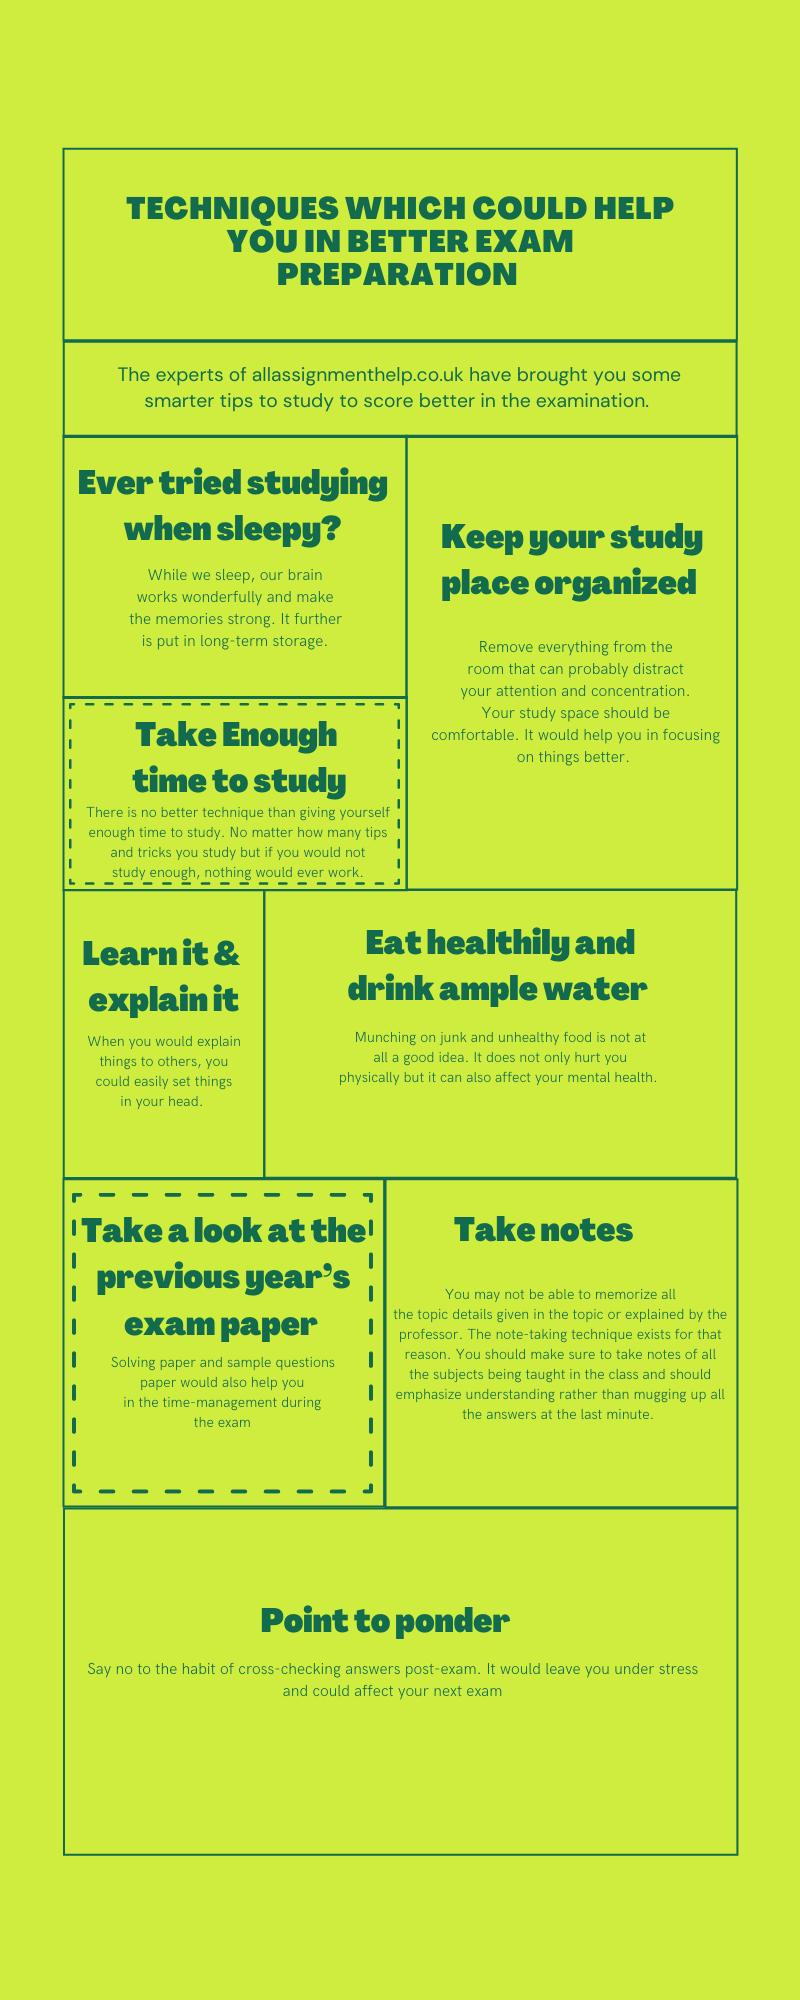 techniques-for-better-exam-preparation